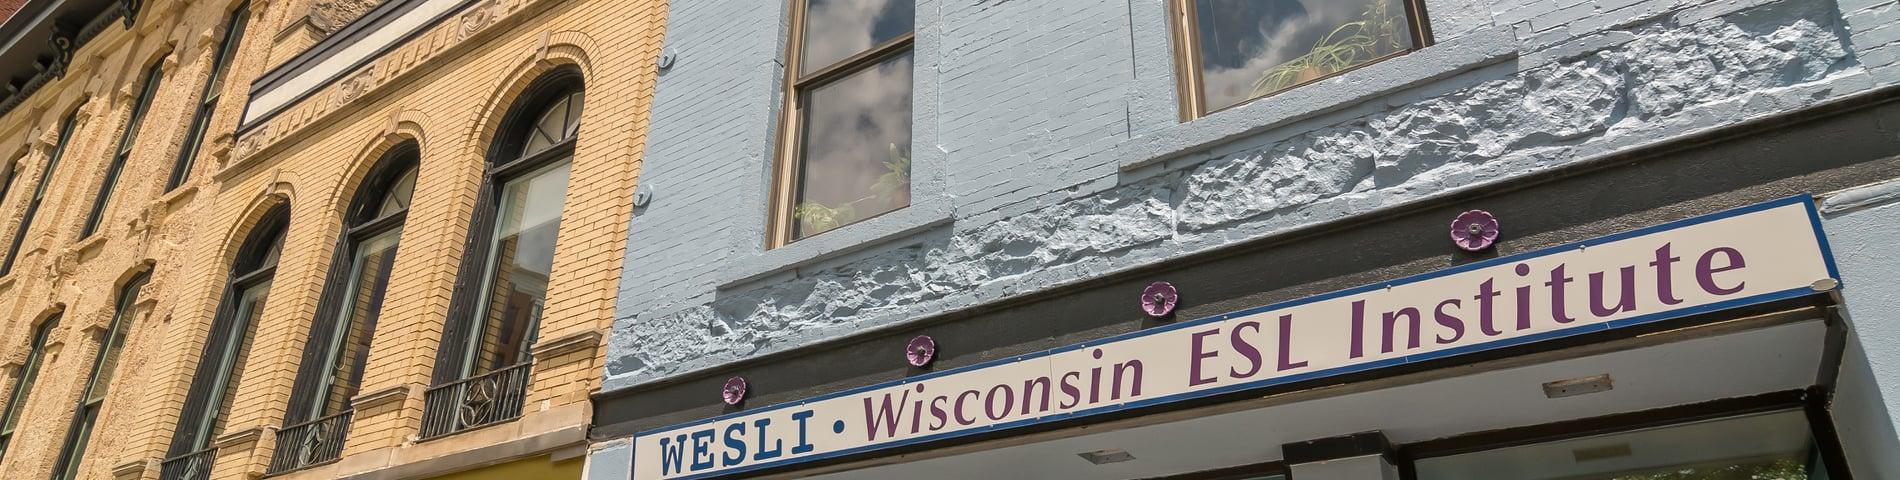 WESLI Wisconsin ESL Institute snímek 1